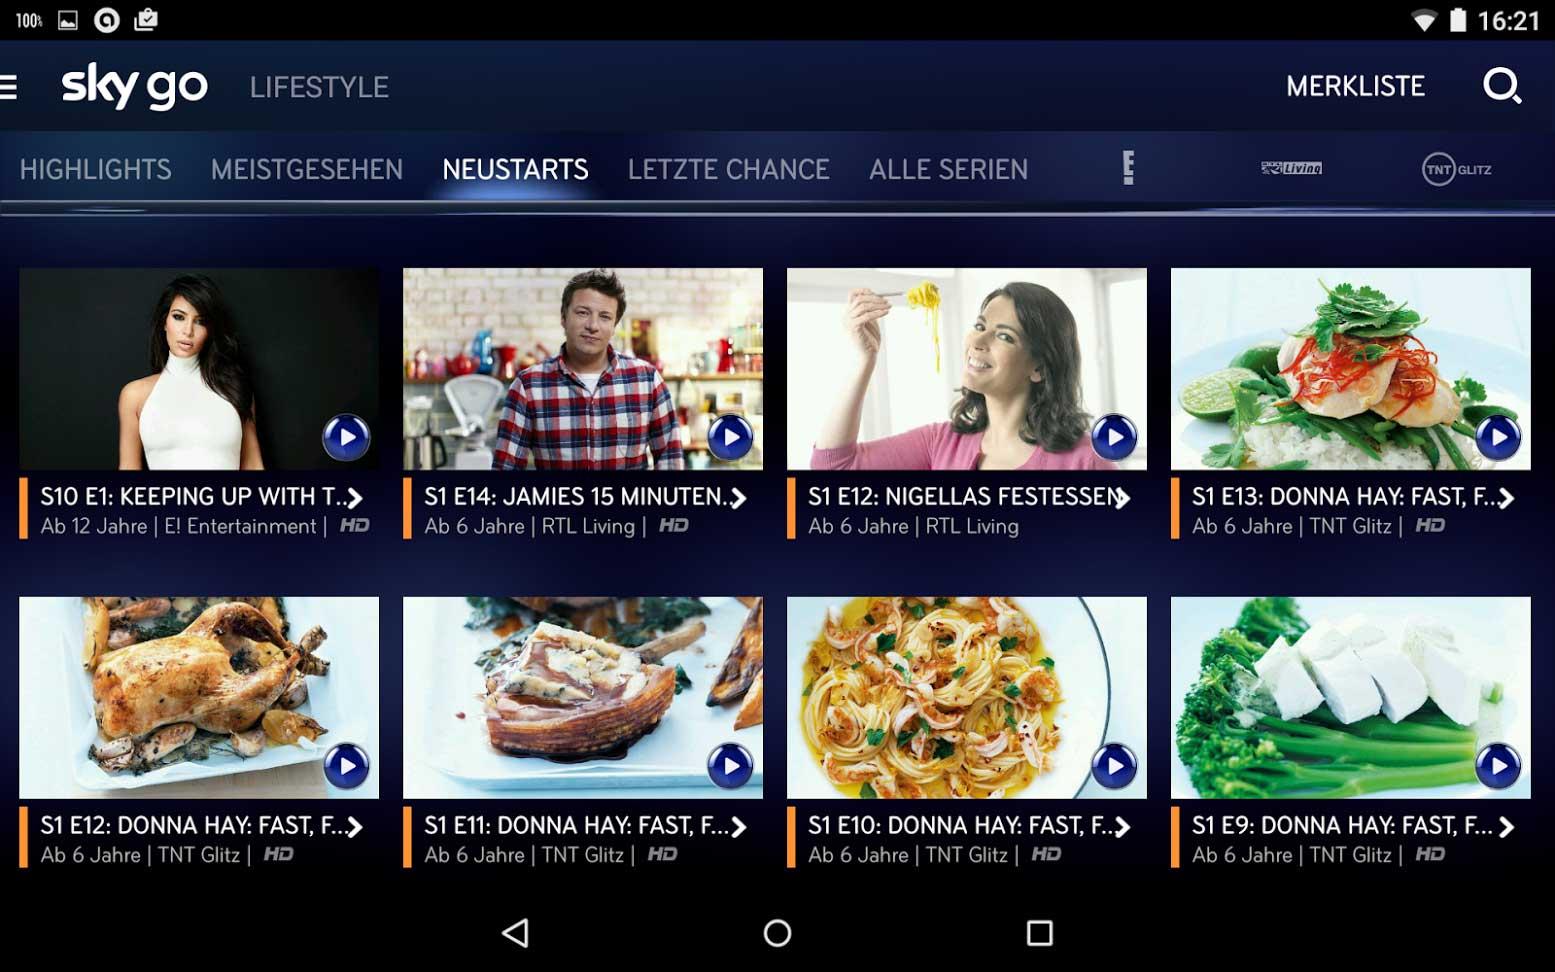 Lifestyle-Bereich bei Sky Go | Screenshot: Redaktion